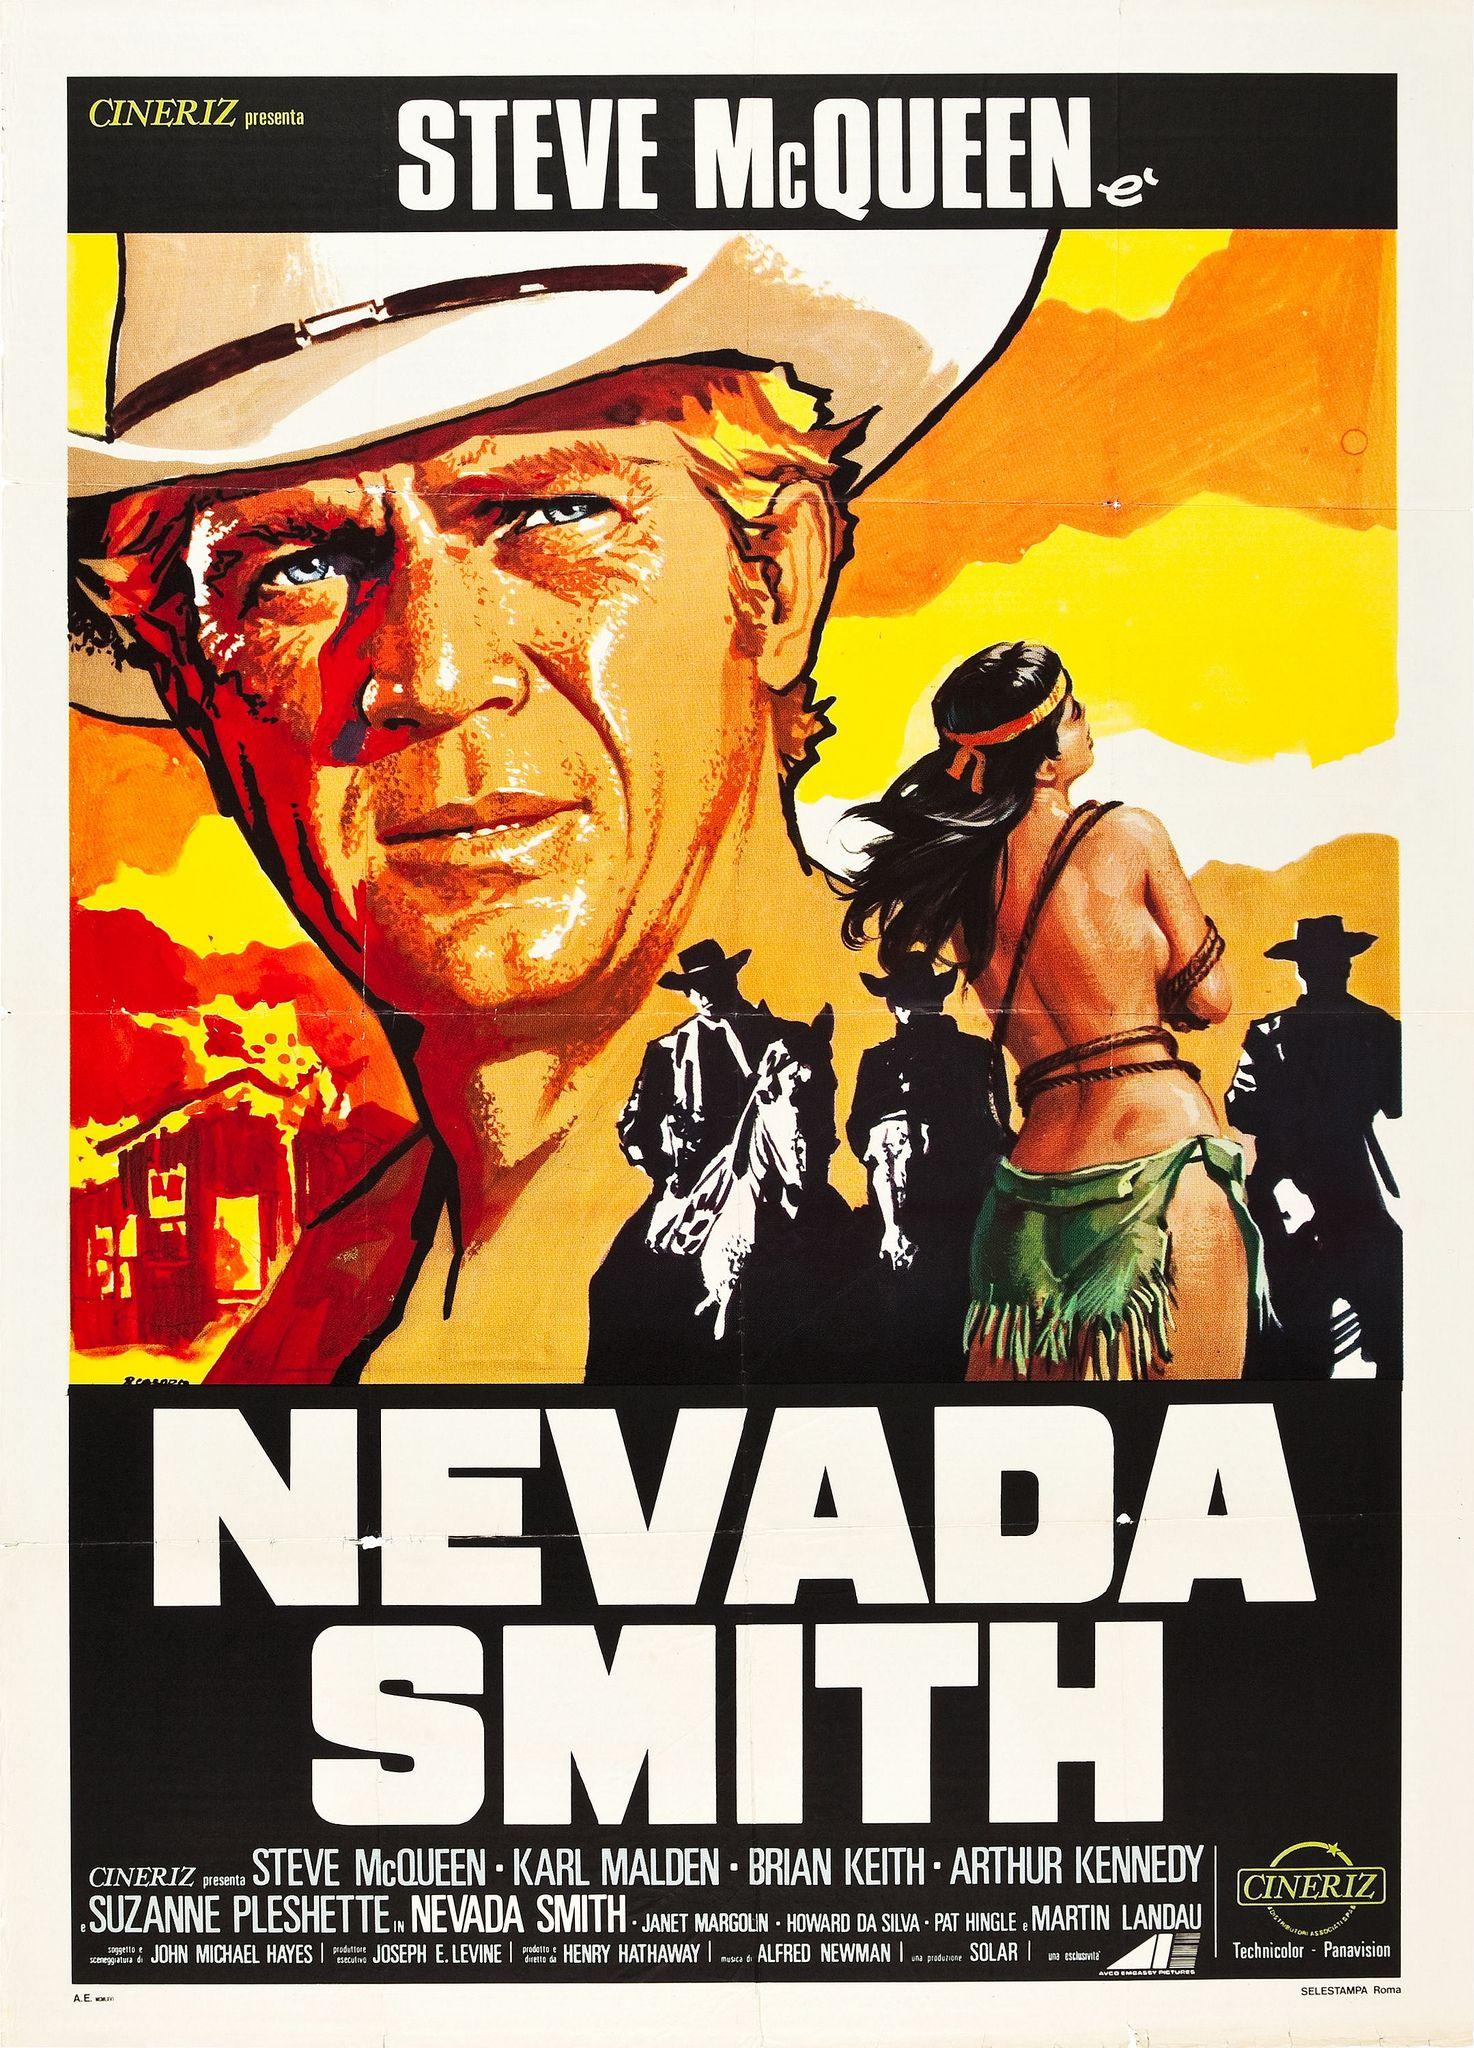 Nevada Smith Cineriz 1966 Italian 2 Foglio 39 X 55 This Stunning Italian Poste Carteles De Peliculas Famosas Carteleras De Cine Carteles De Cine